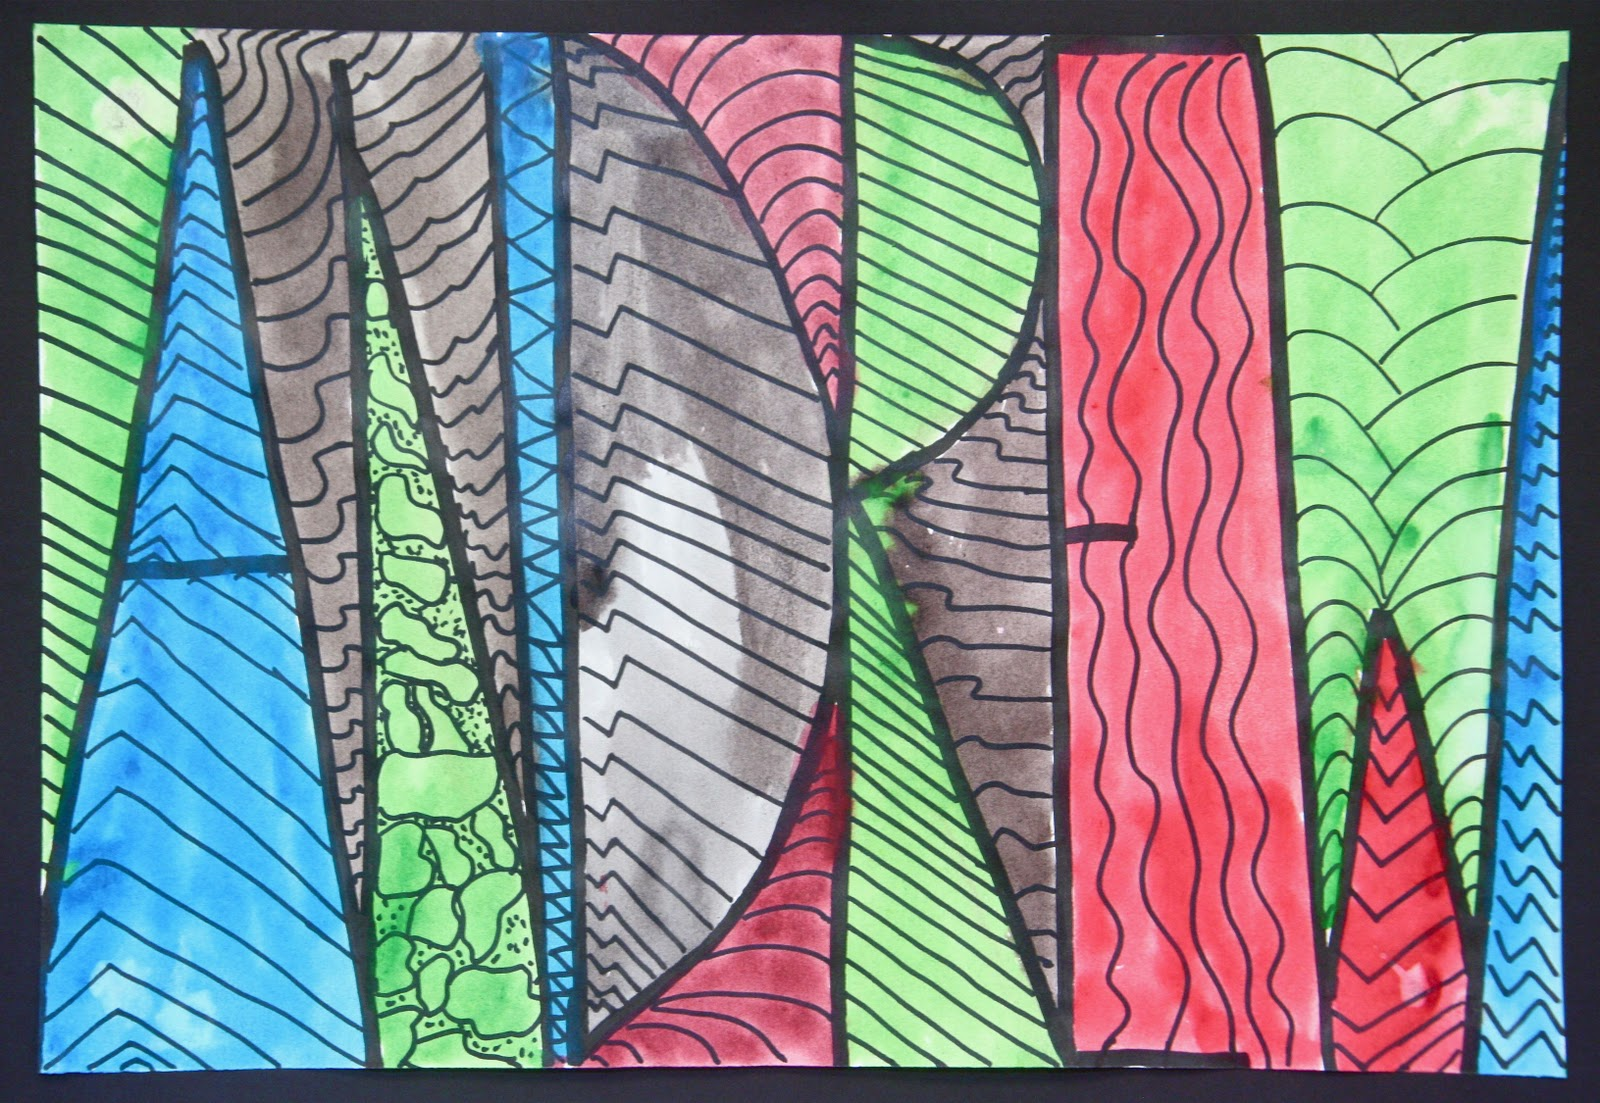 Name Design Art : Splish splash splatter abstract name designs finished